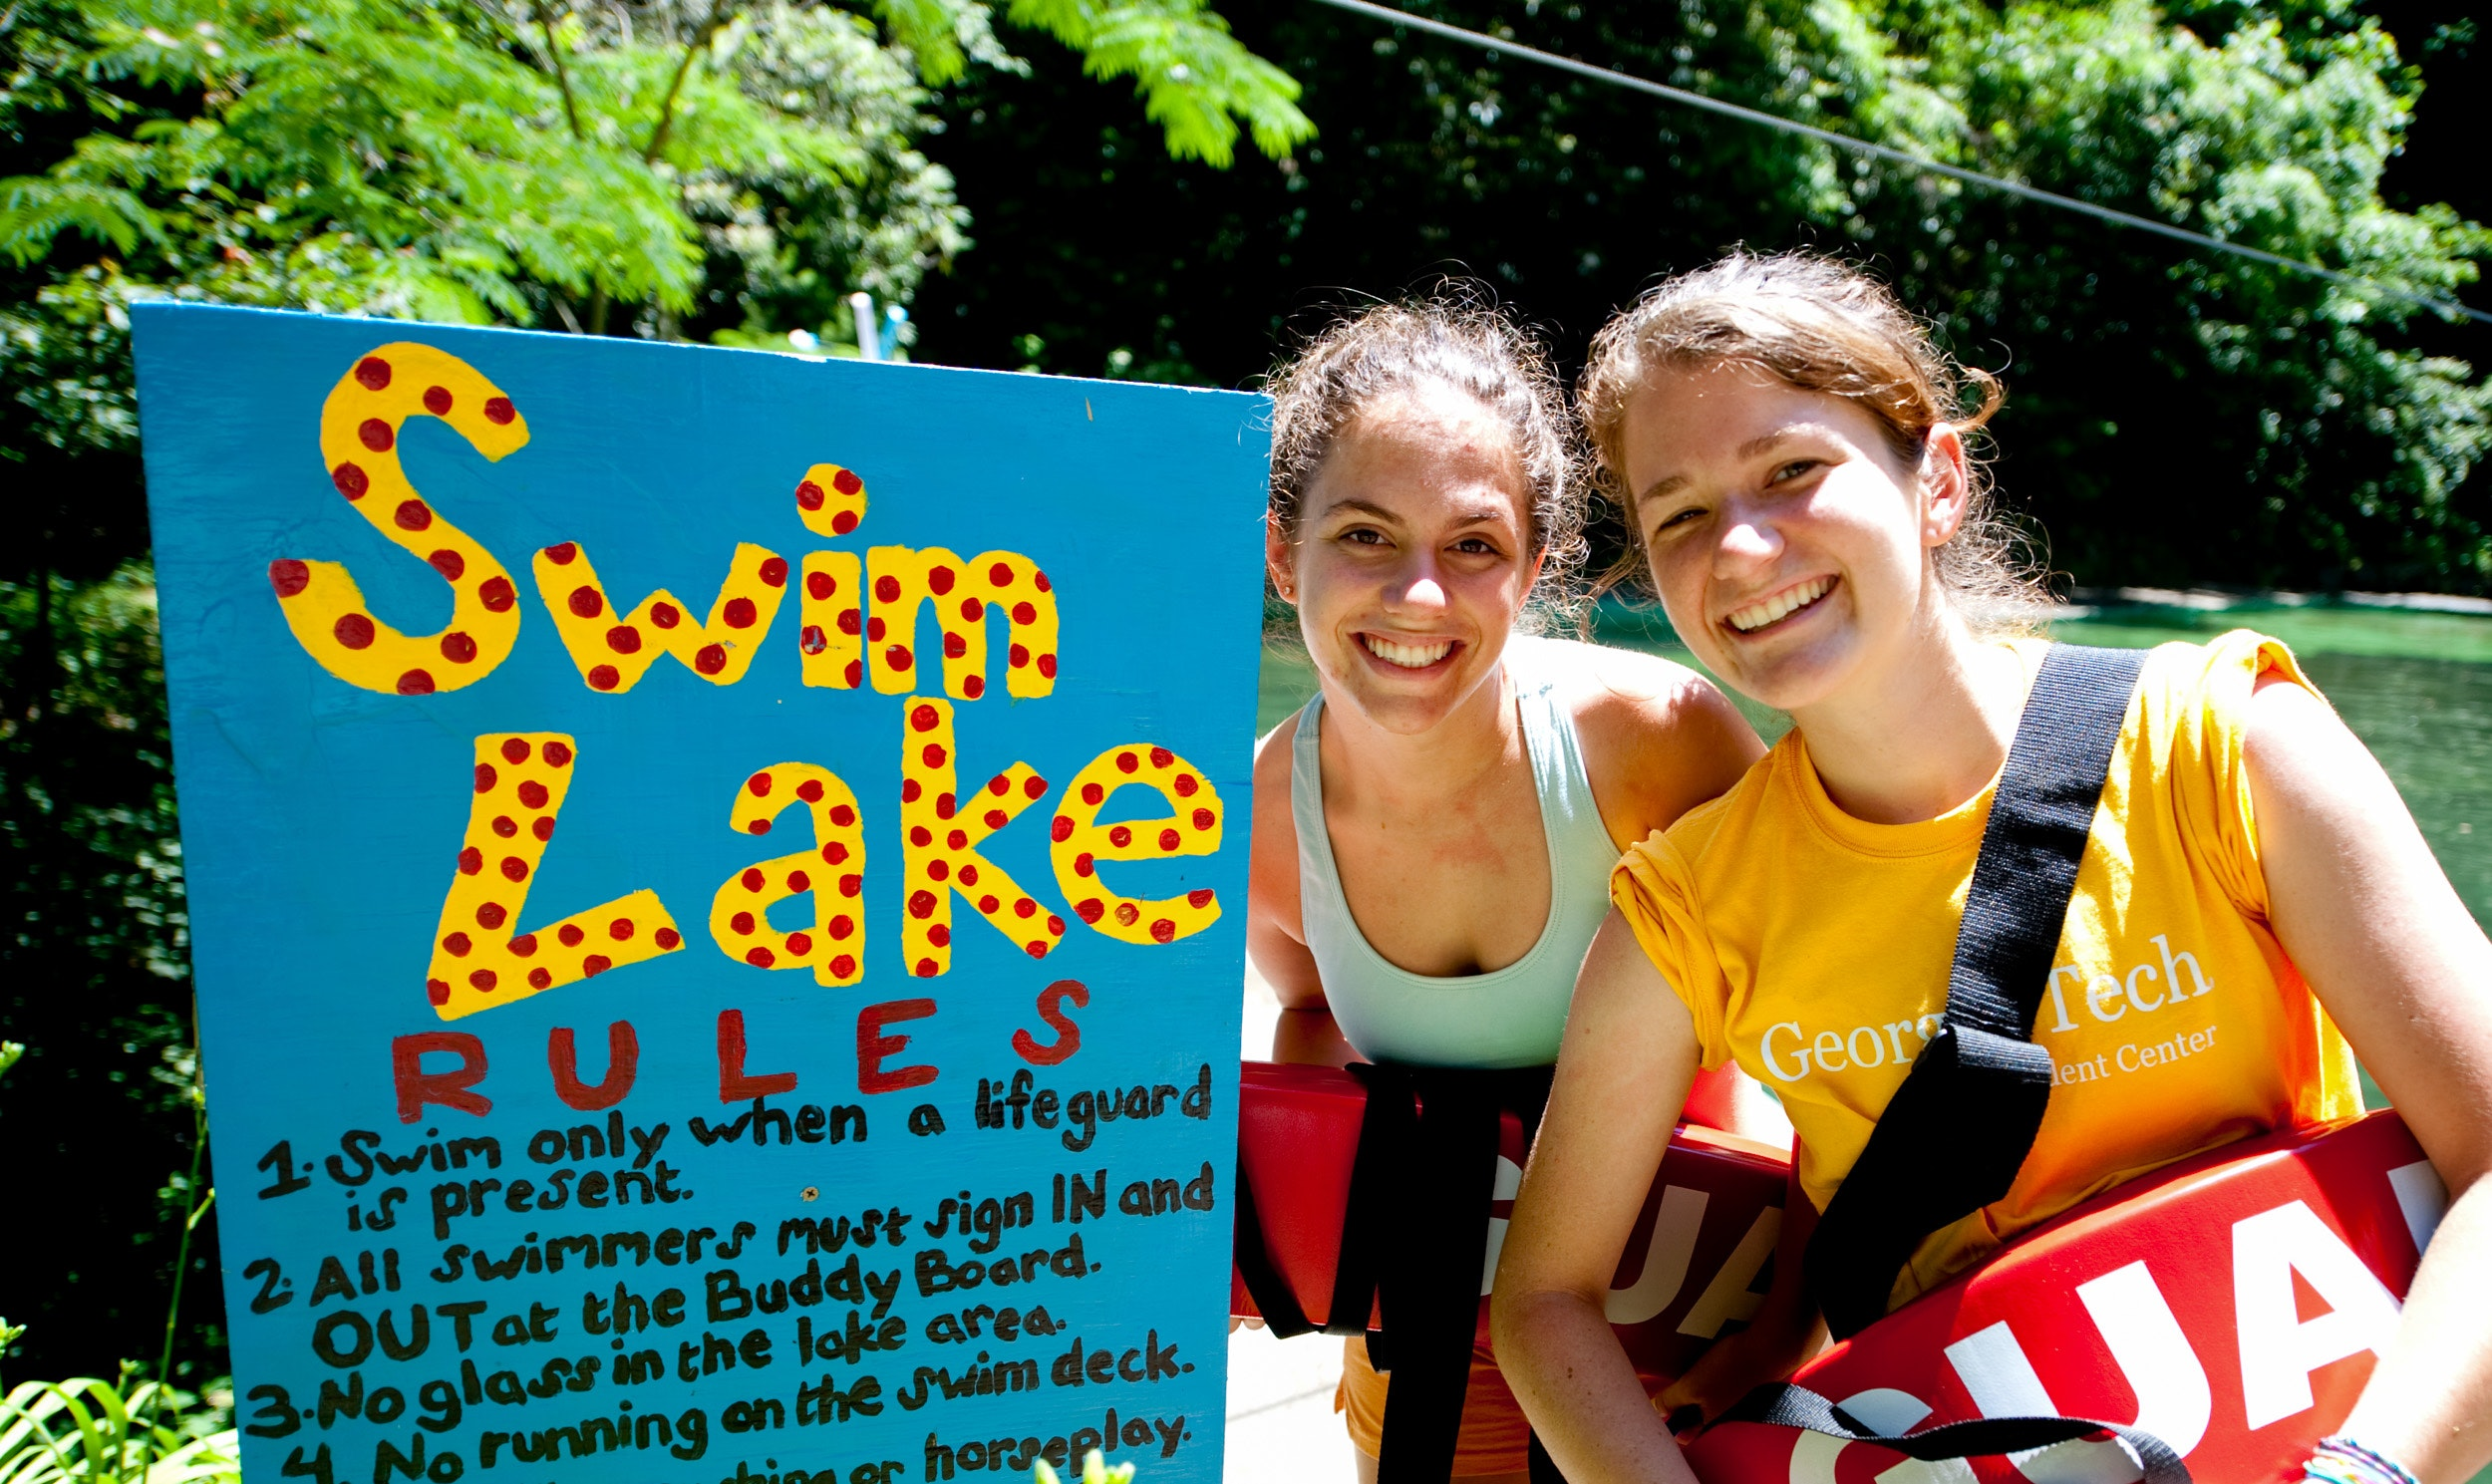 Why work at keystone summer camp for girls in brevard north carolina.jpg?ixlib=rails 2.1